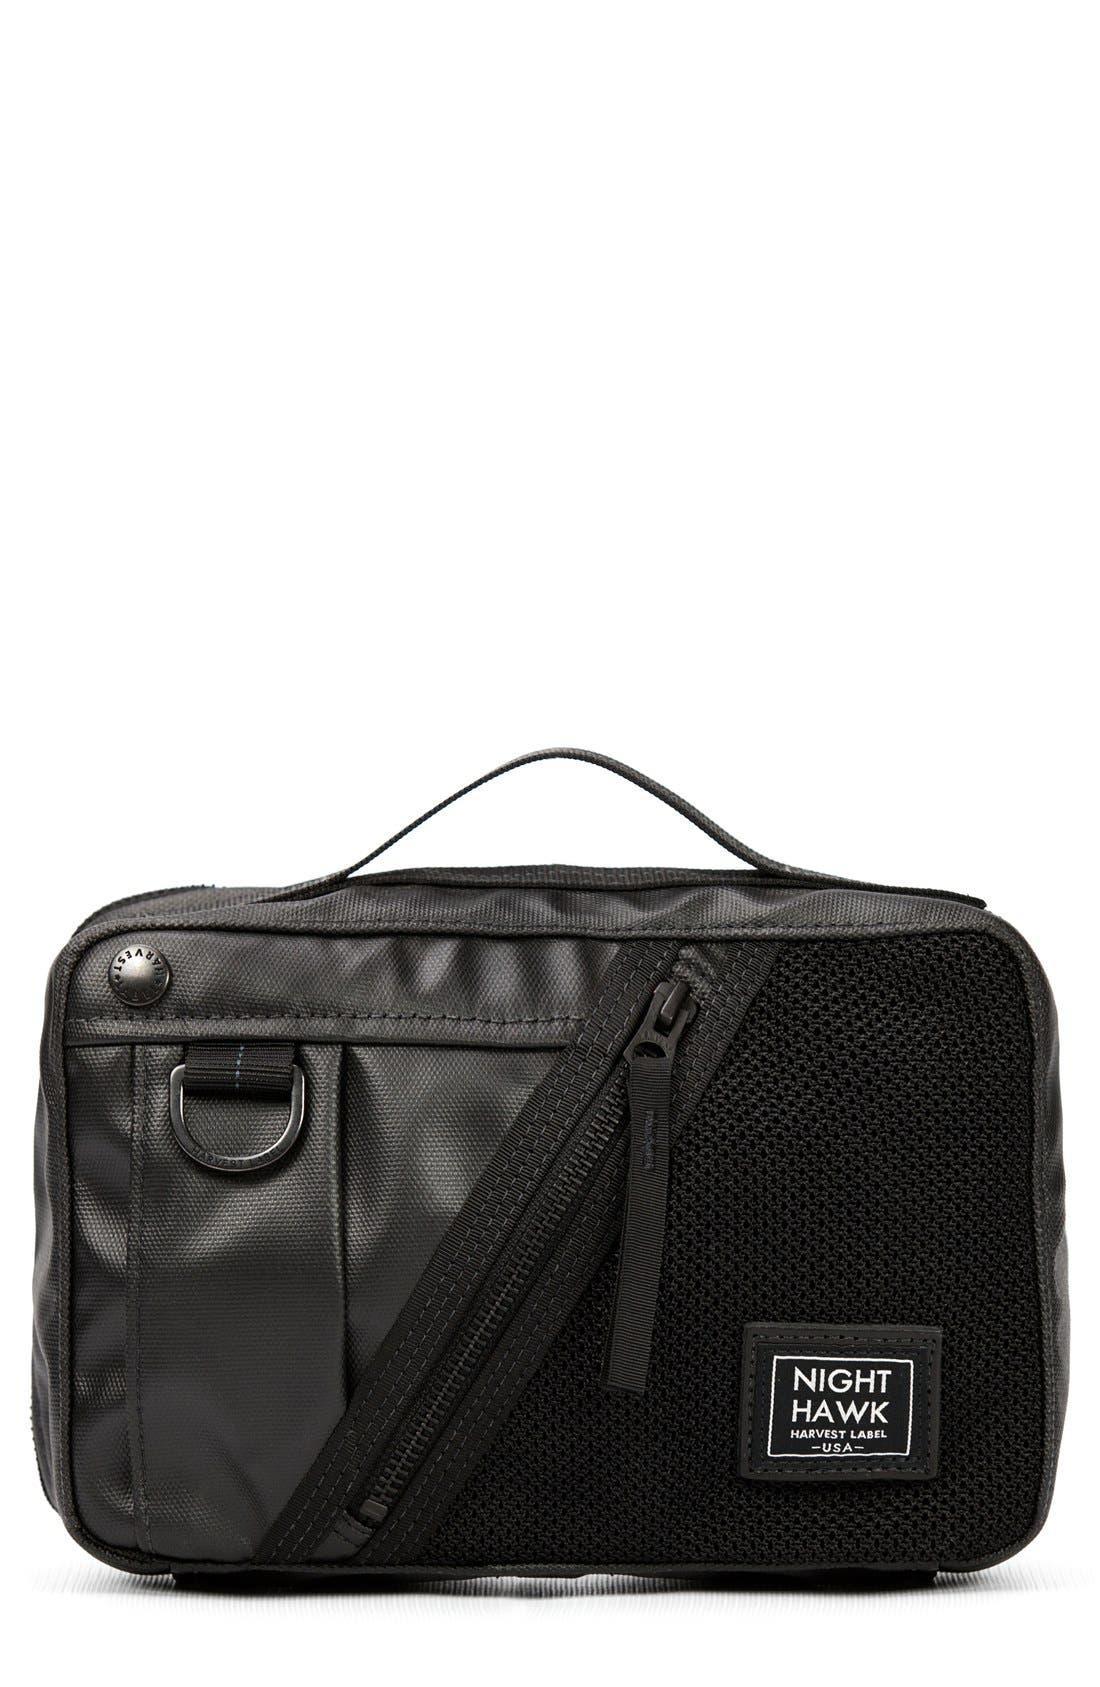 'NightHawk' Travel Kit,                         Main,                         color, 001